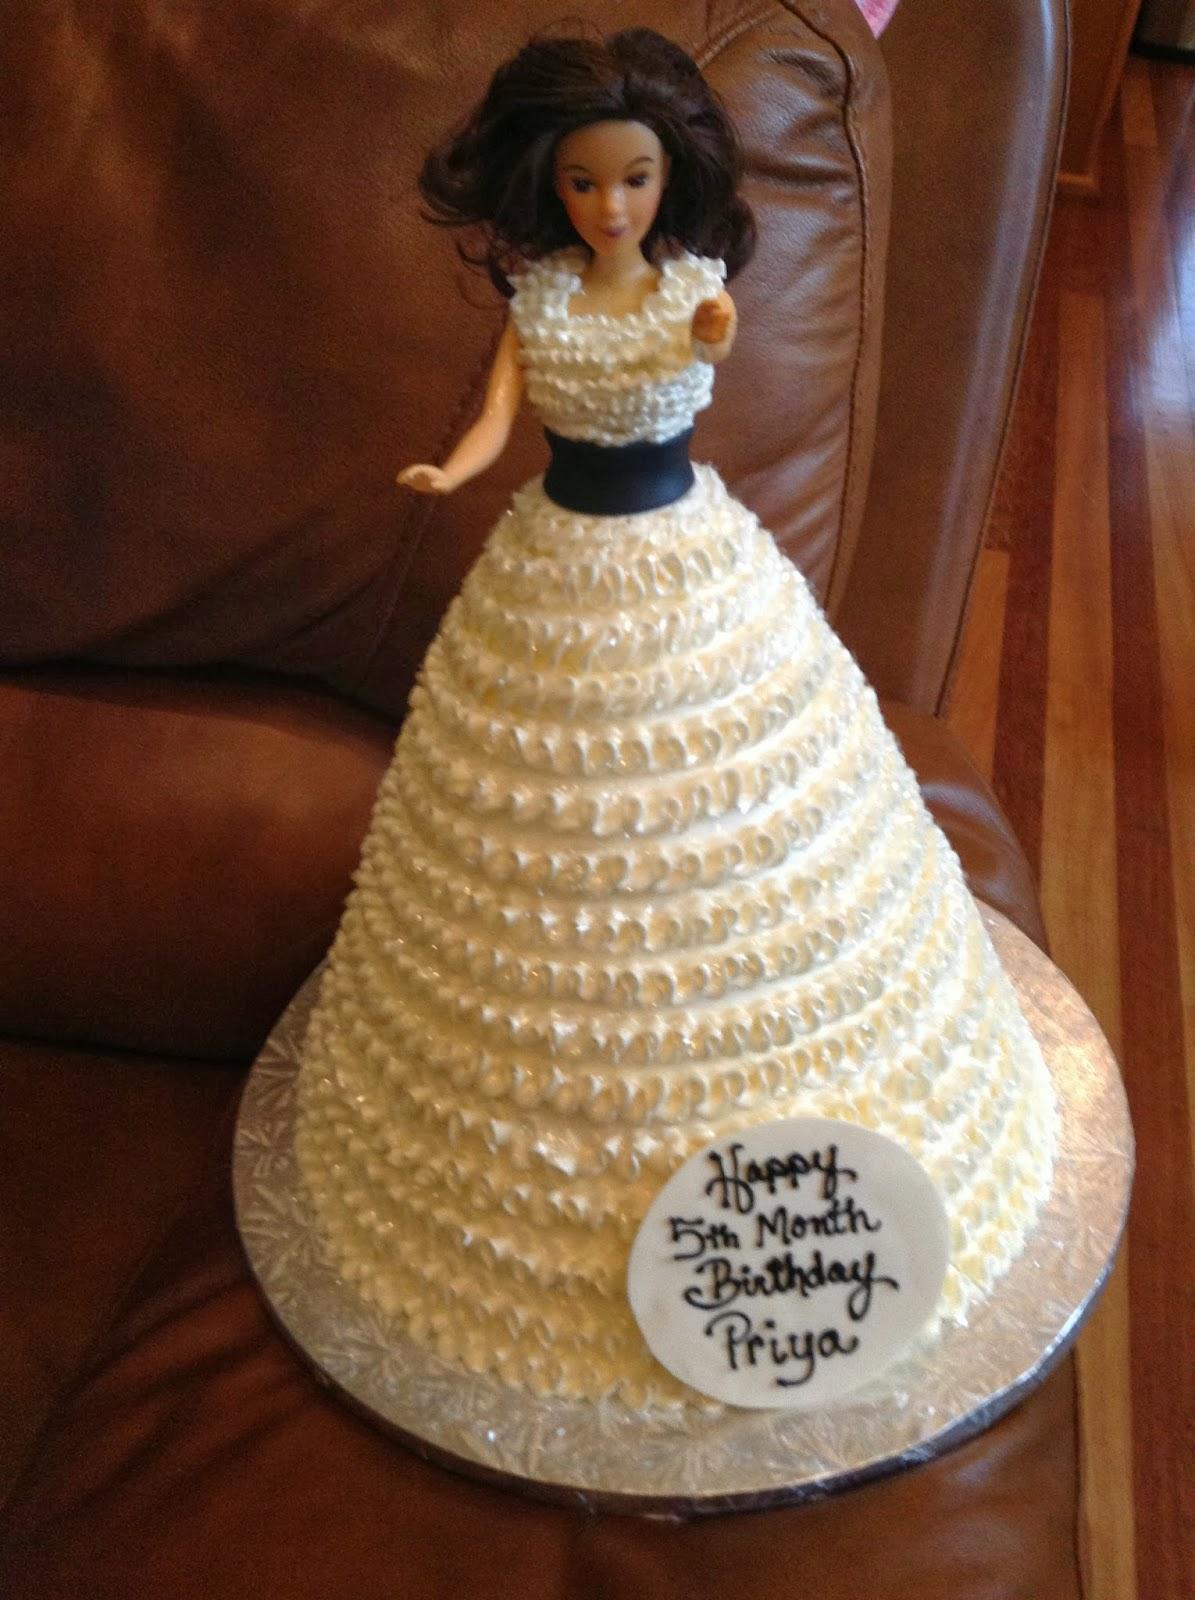 Cake Pic Priya : Vijay Madala, My Story: Priya 5th Month Birthday Cake